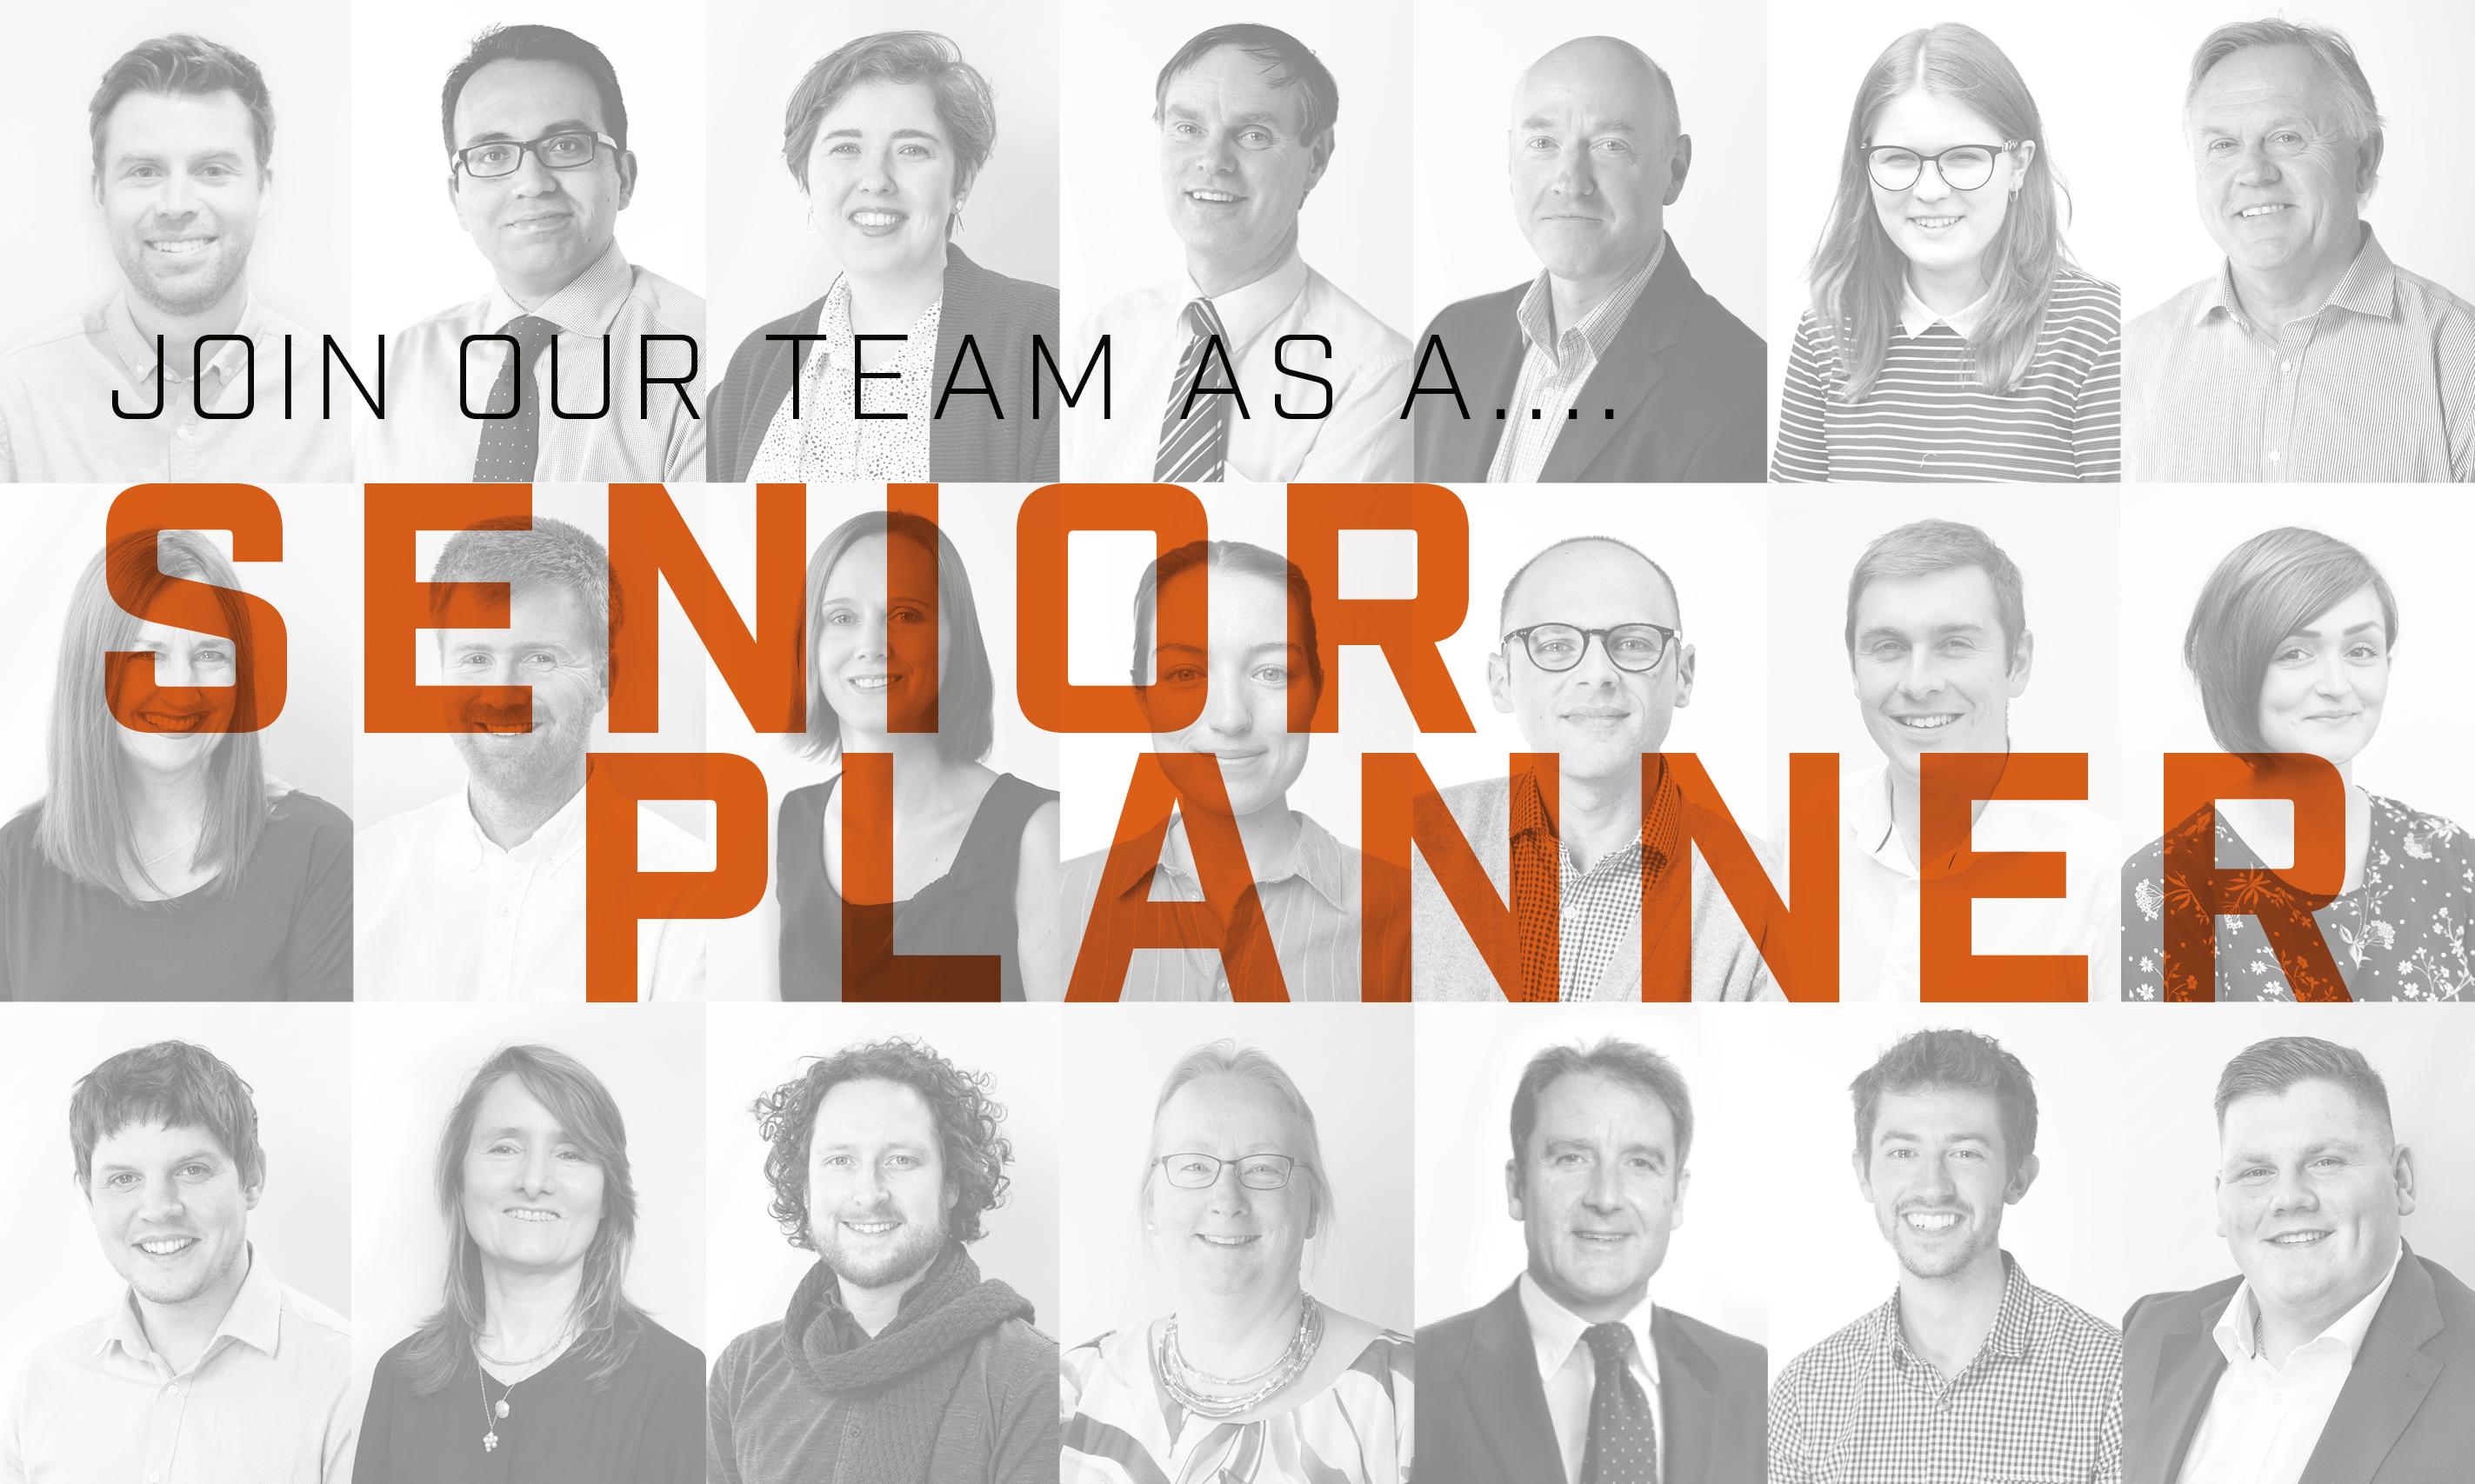 Senior Planner, Job vacancy, Hiring, job, Senior, planner, town planner, WWA Studios, WWA, West Waddy Archadia, West Waddy, Archadia, Architecture, Urban Design, Town Planning